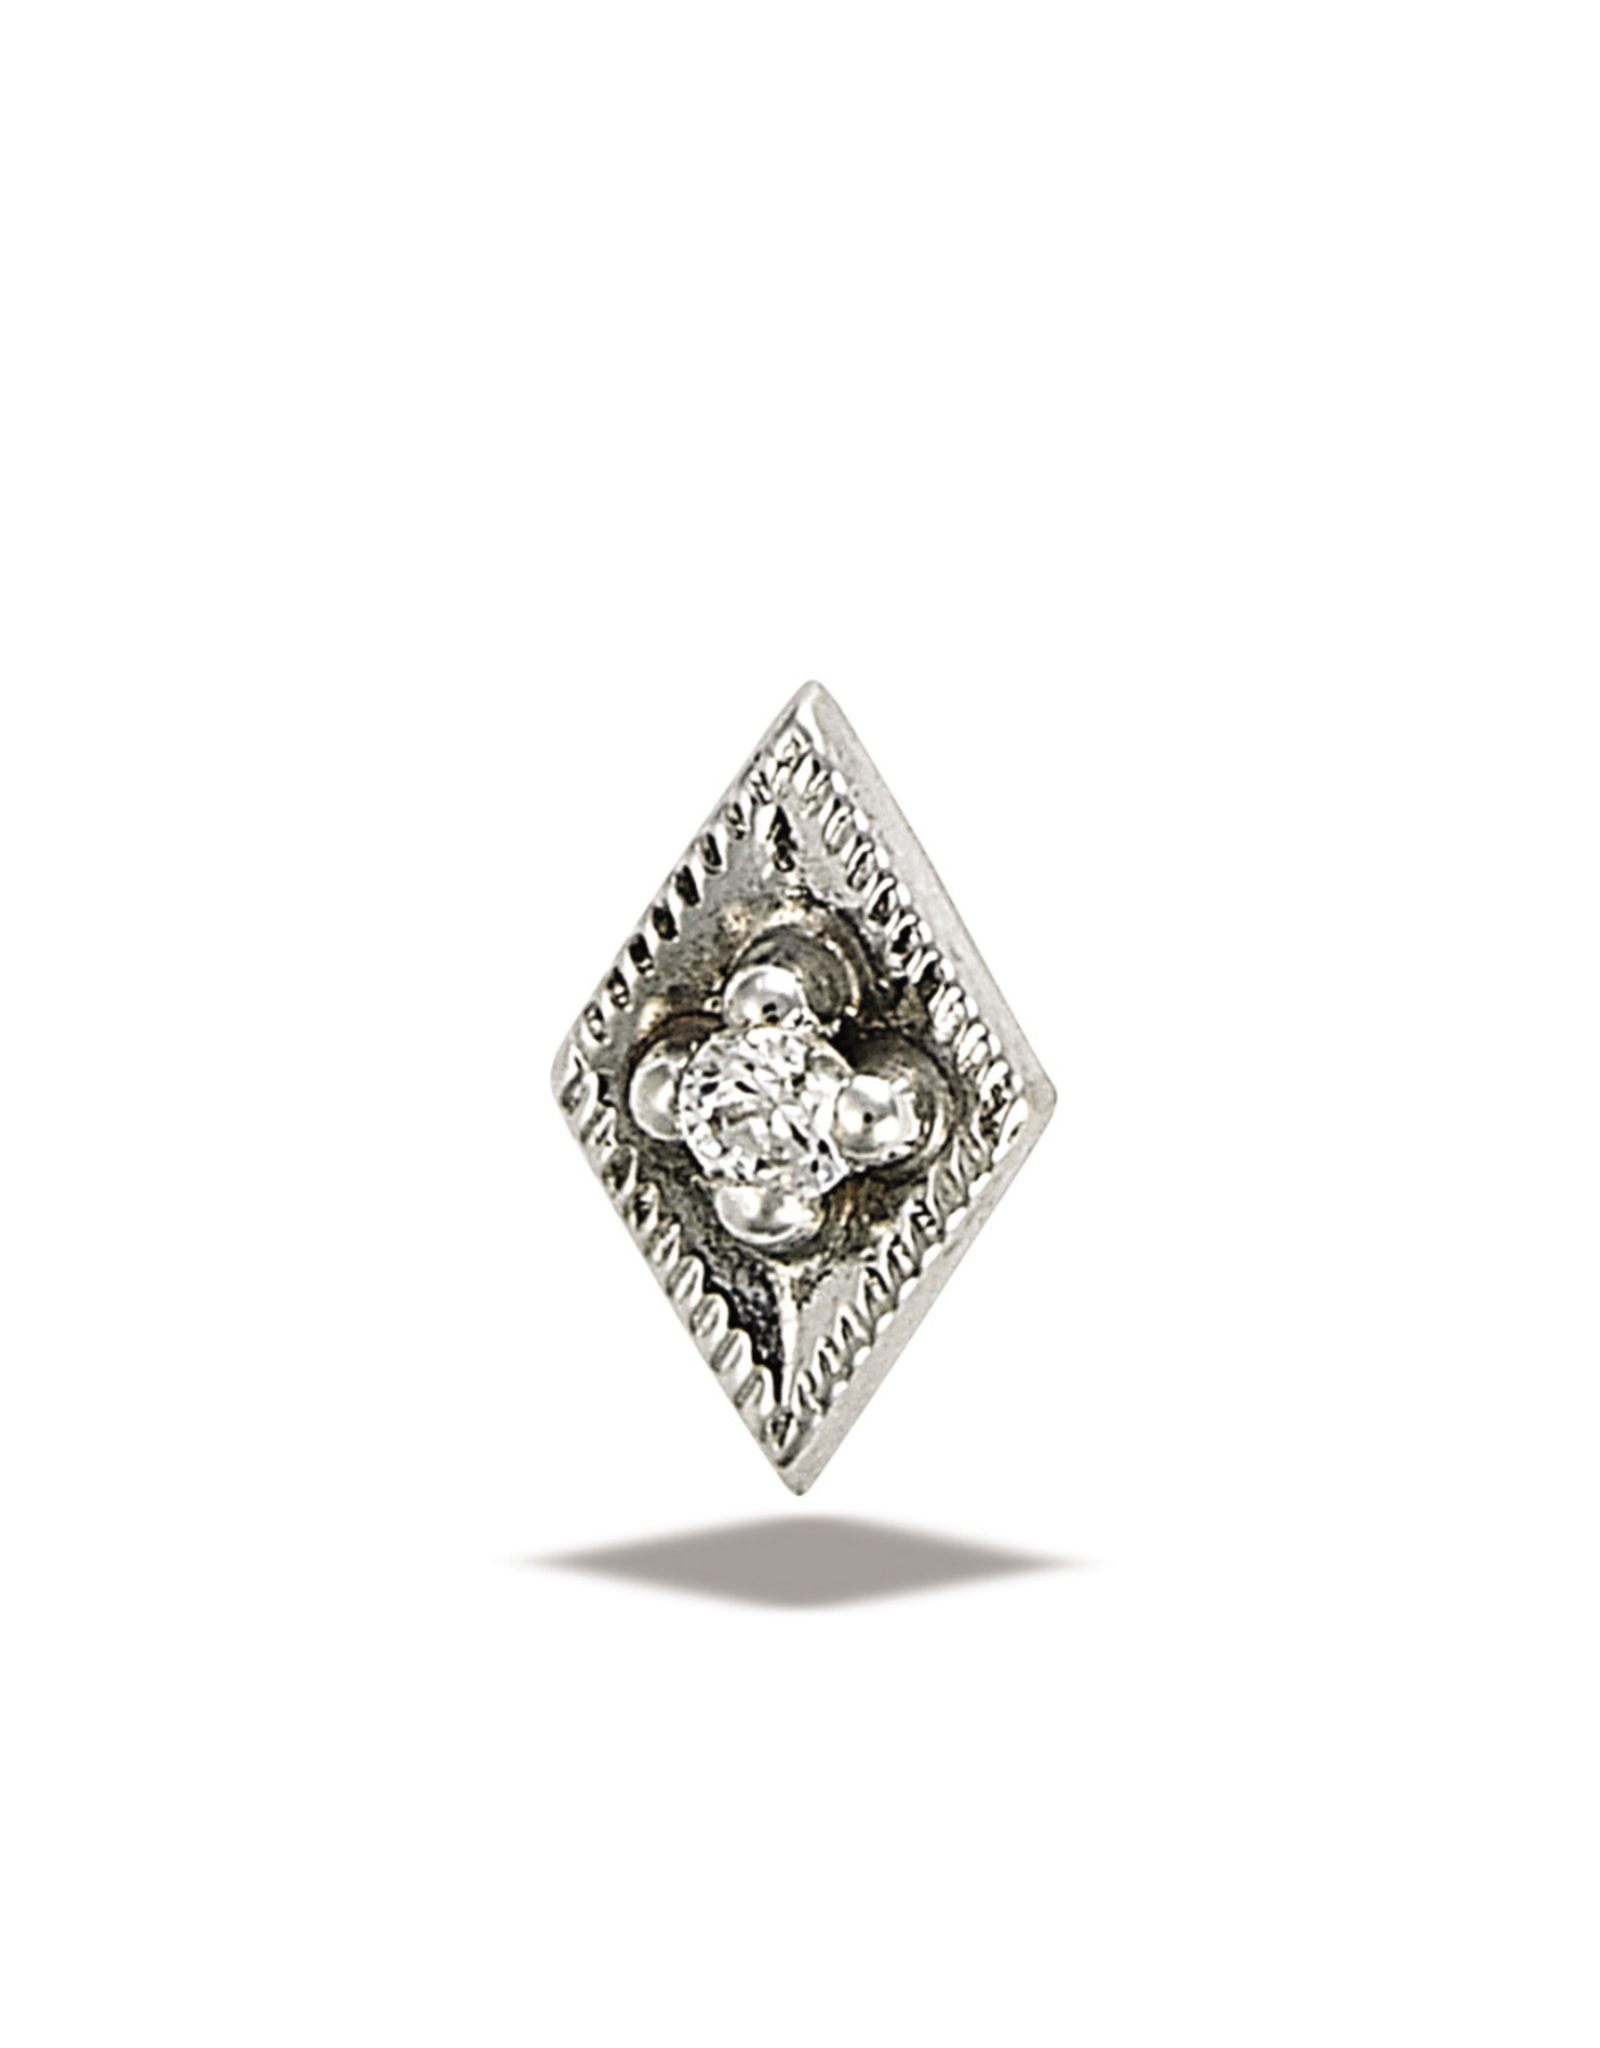 14k WG Rhombus Diamond 1.5mm Stone Threadless End